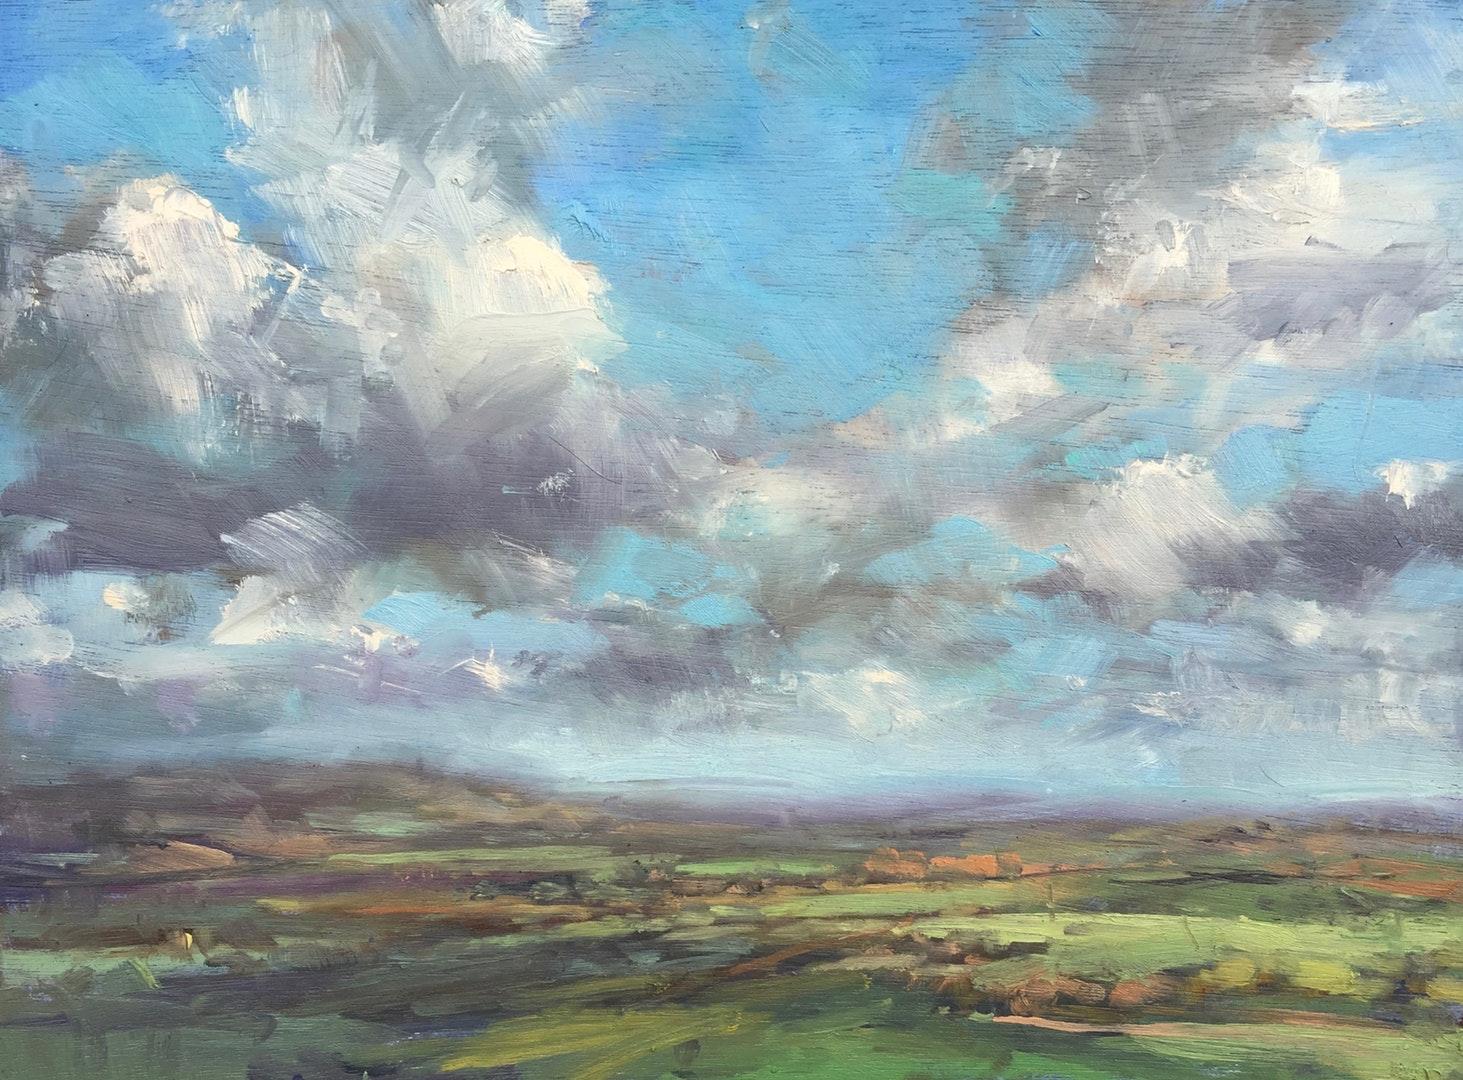 'Towards Cherhill', Georgina Potter, Oil on board, 23 x 30.5 x 1 cm